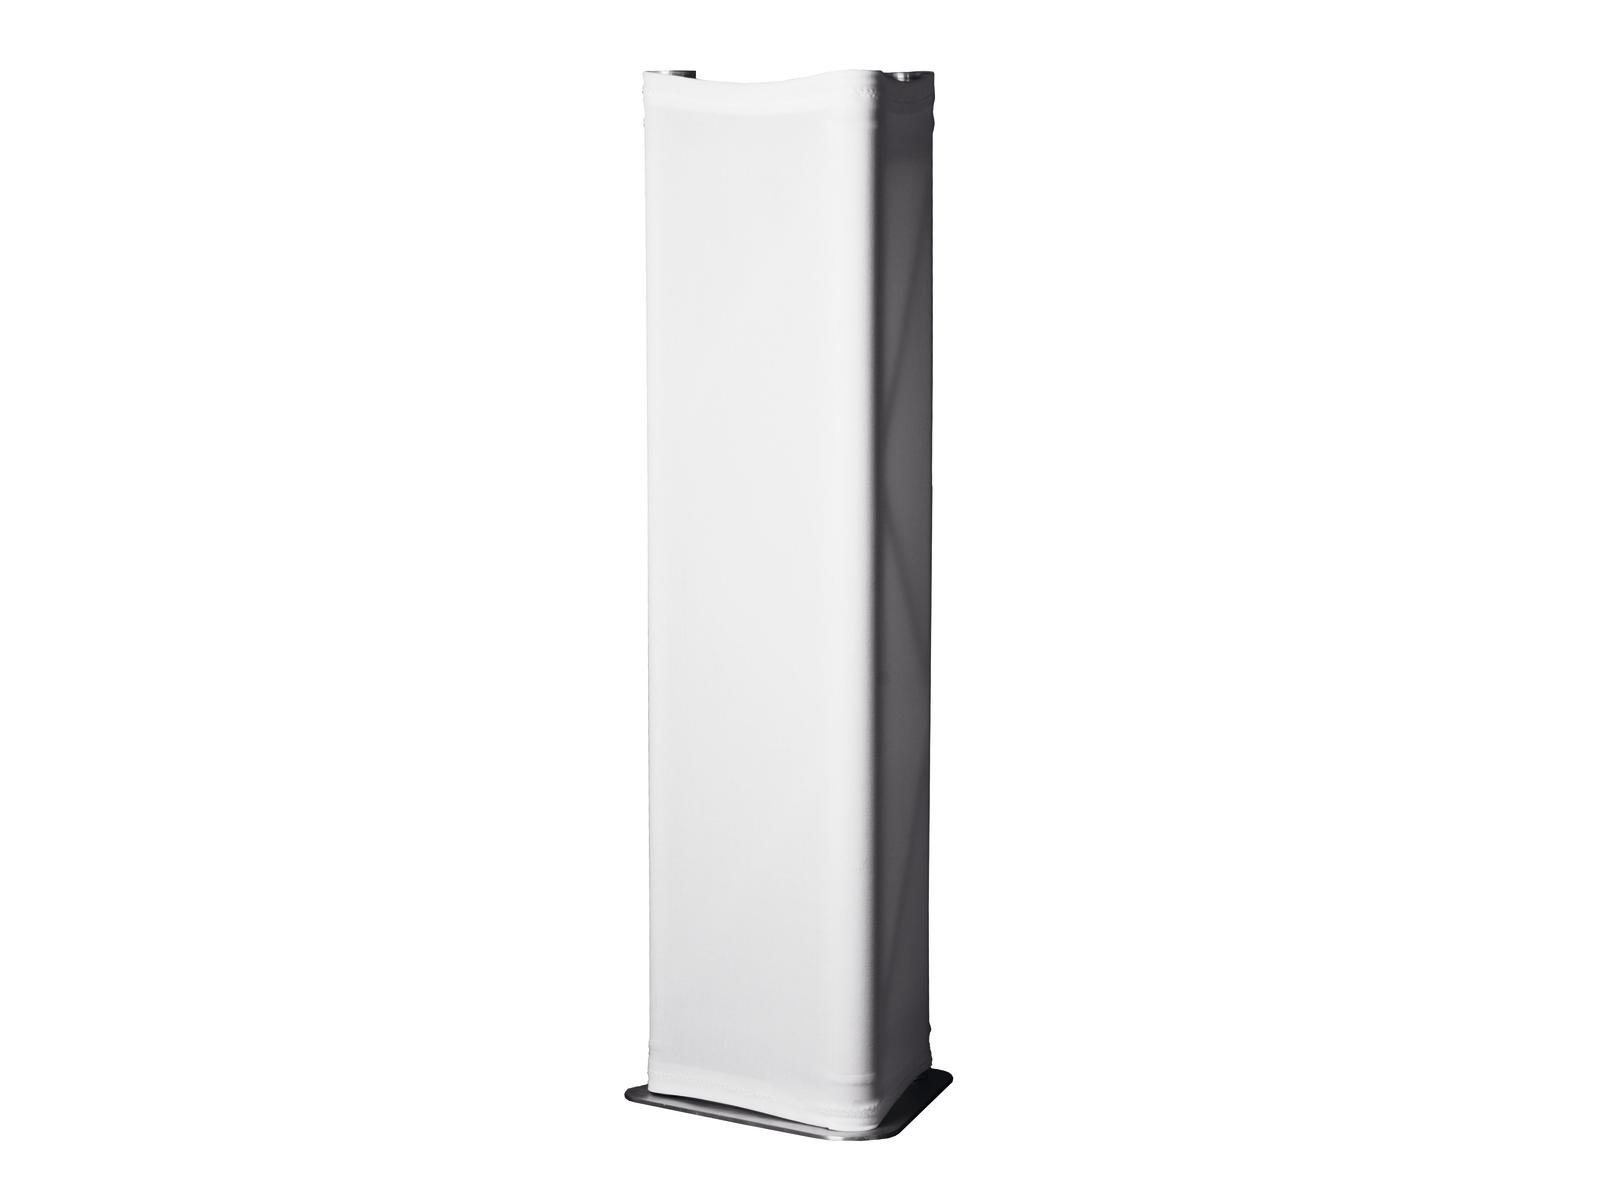 ESPANDERE XPTC10KVW Capriata di copertura 100cm bianco